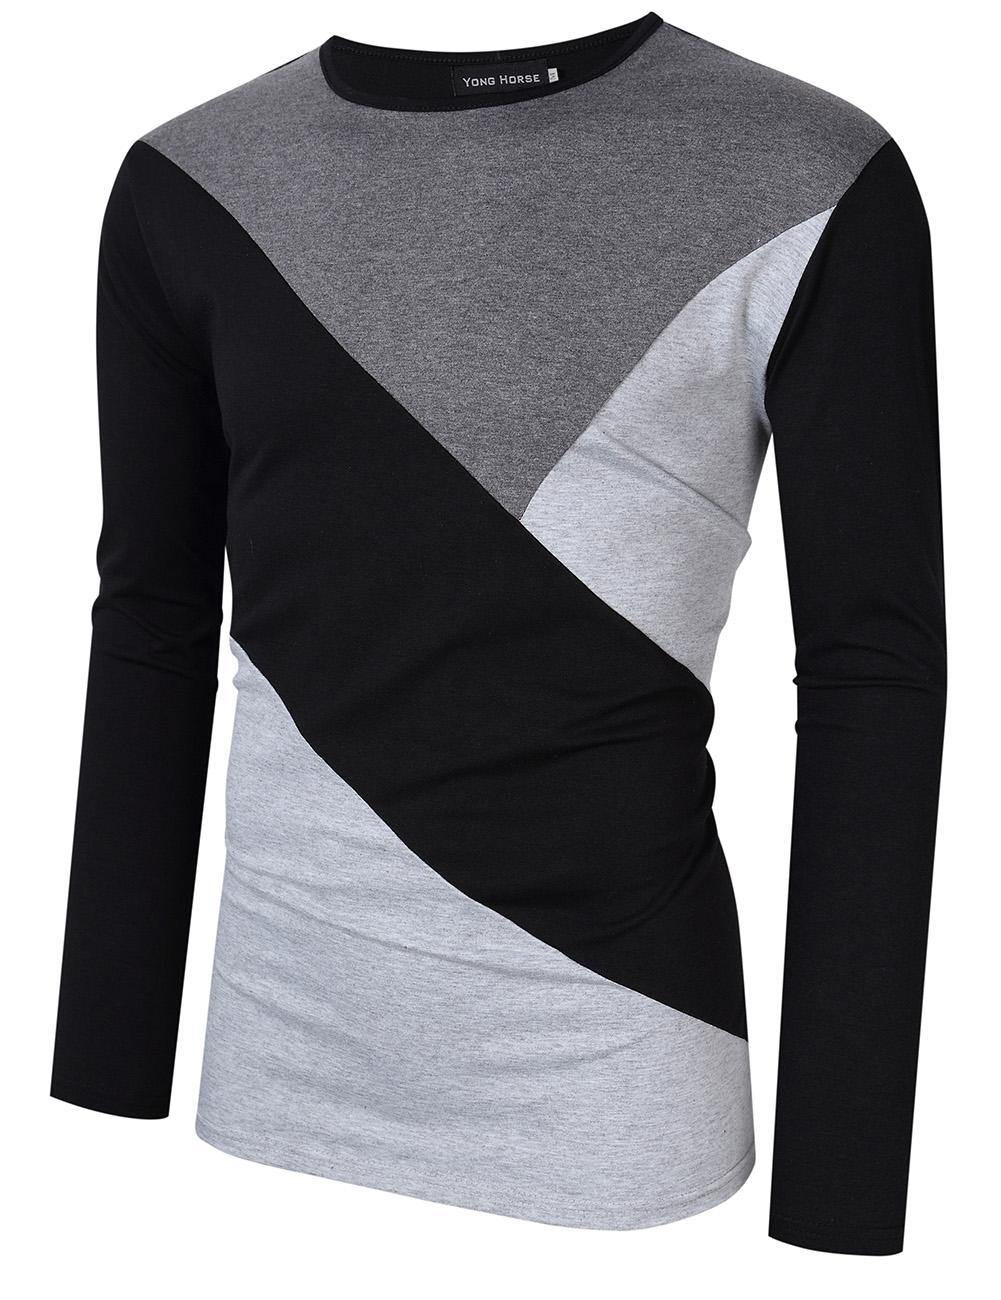 [US Direct] Yong Horse Men's Contrast Color Crewneck Long Sleeve Basic T Shirt Top Gray + black_XL